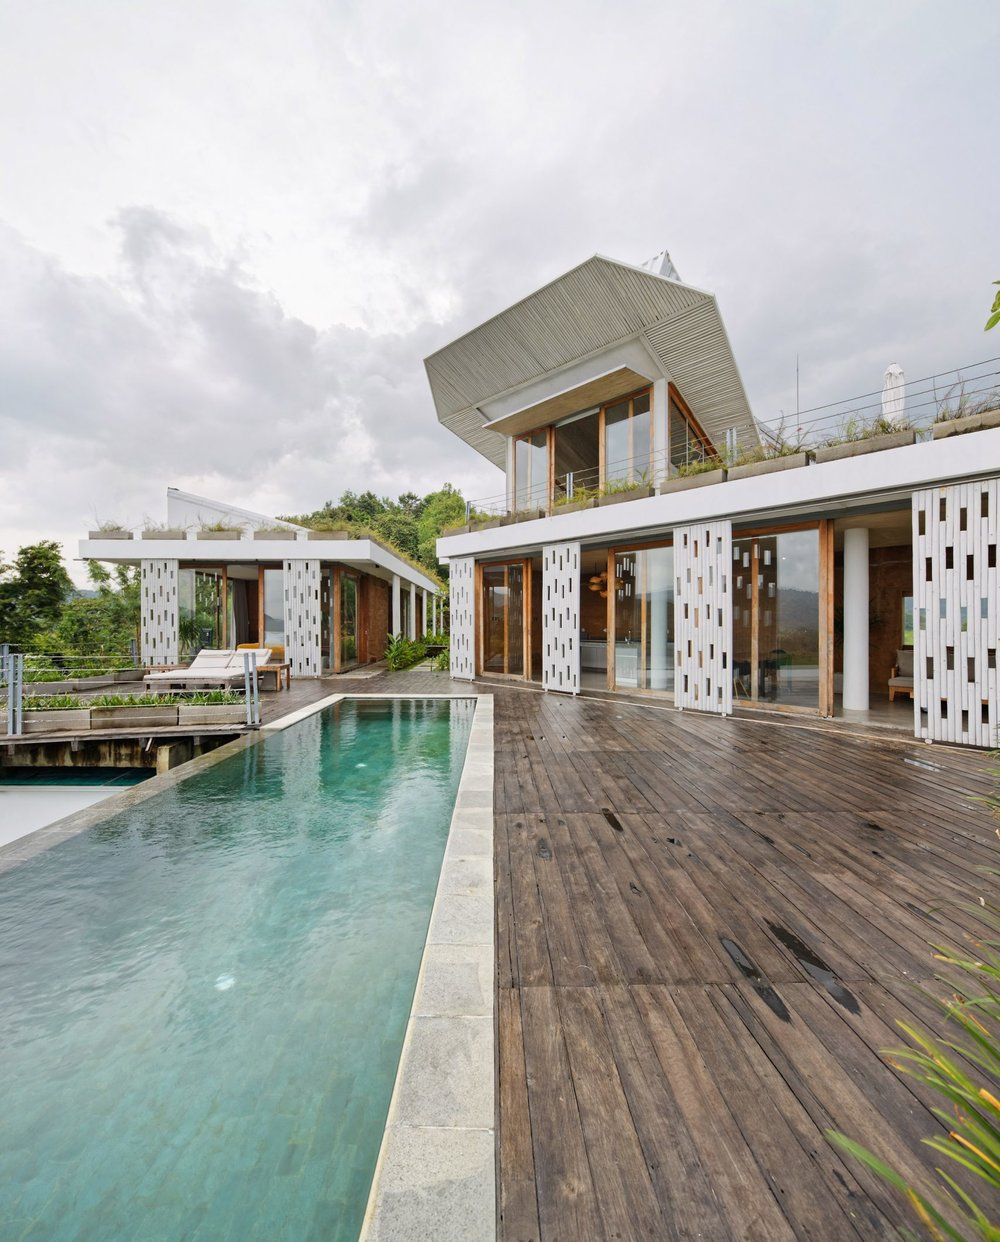 clay-house-budi-pradono-architects-architecture_dezeen_2364_col_2-1704x2116.jpg